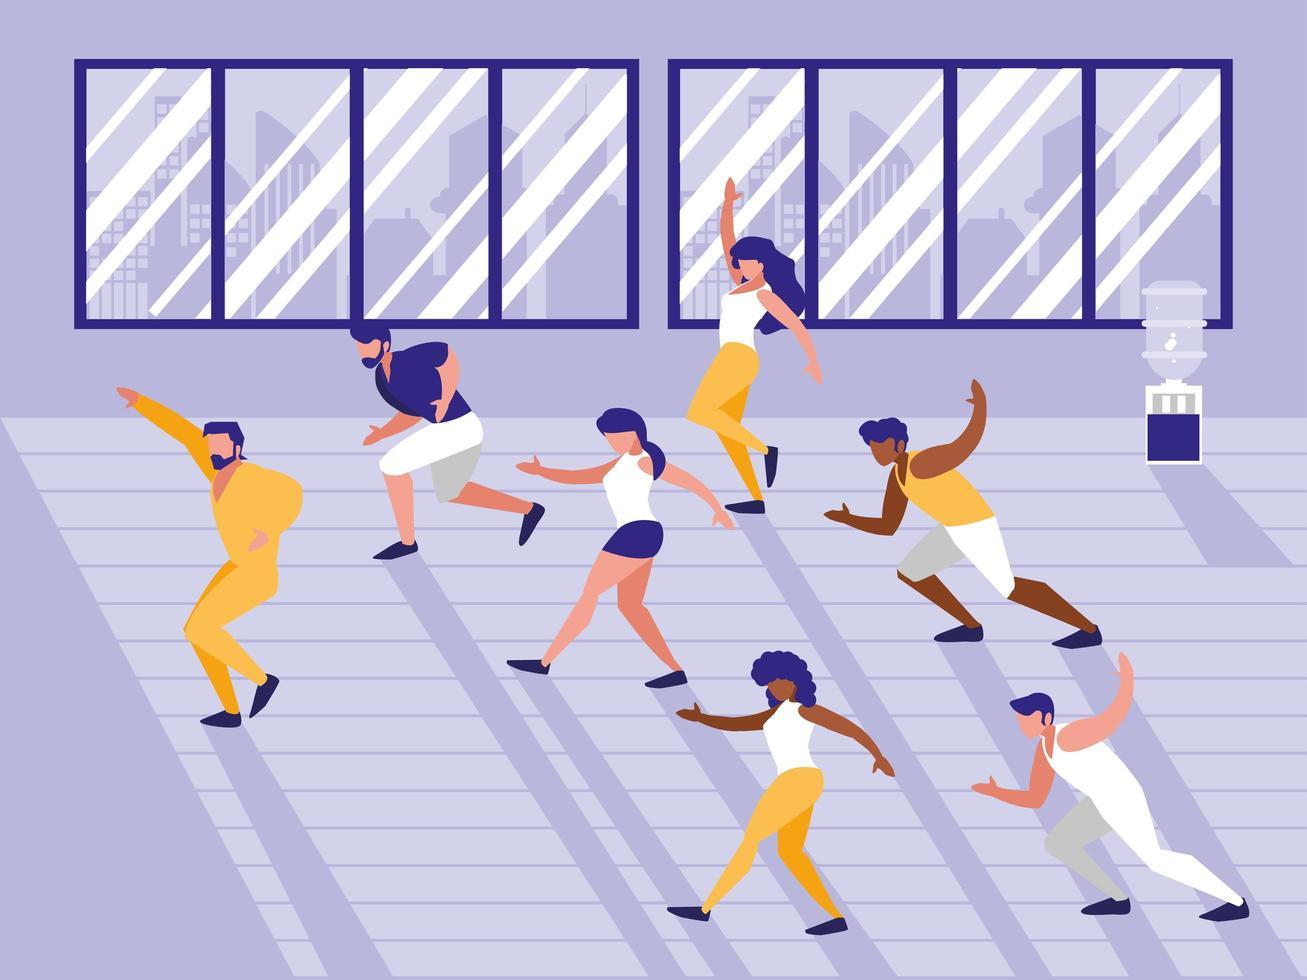 mensen doen aerobics avatar karakter vector